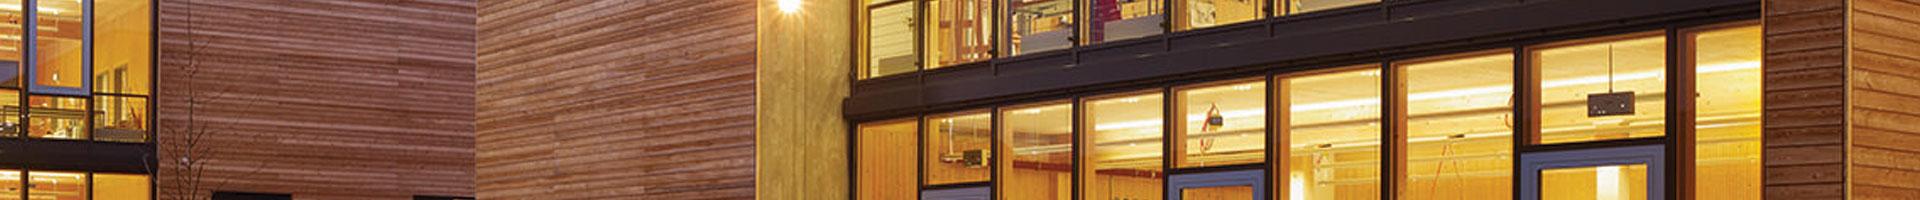 curtainwall_timber